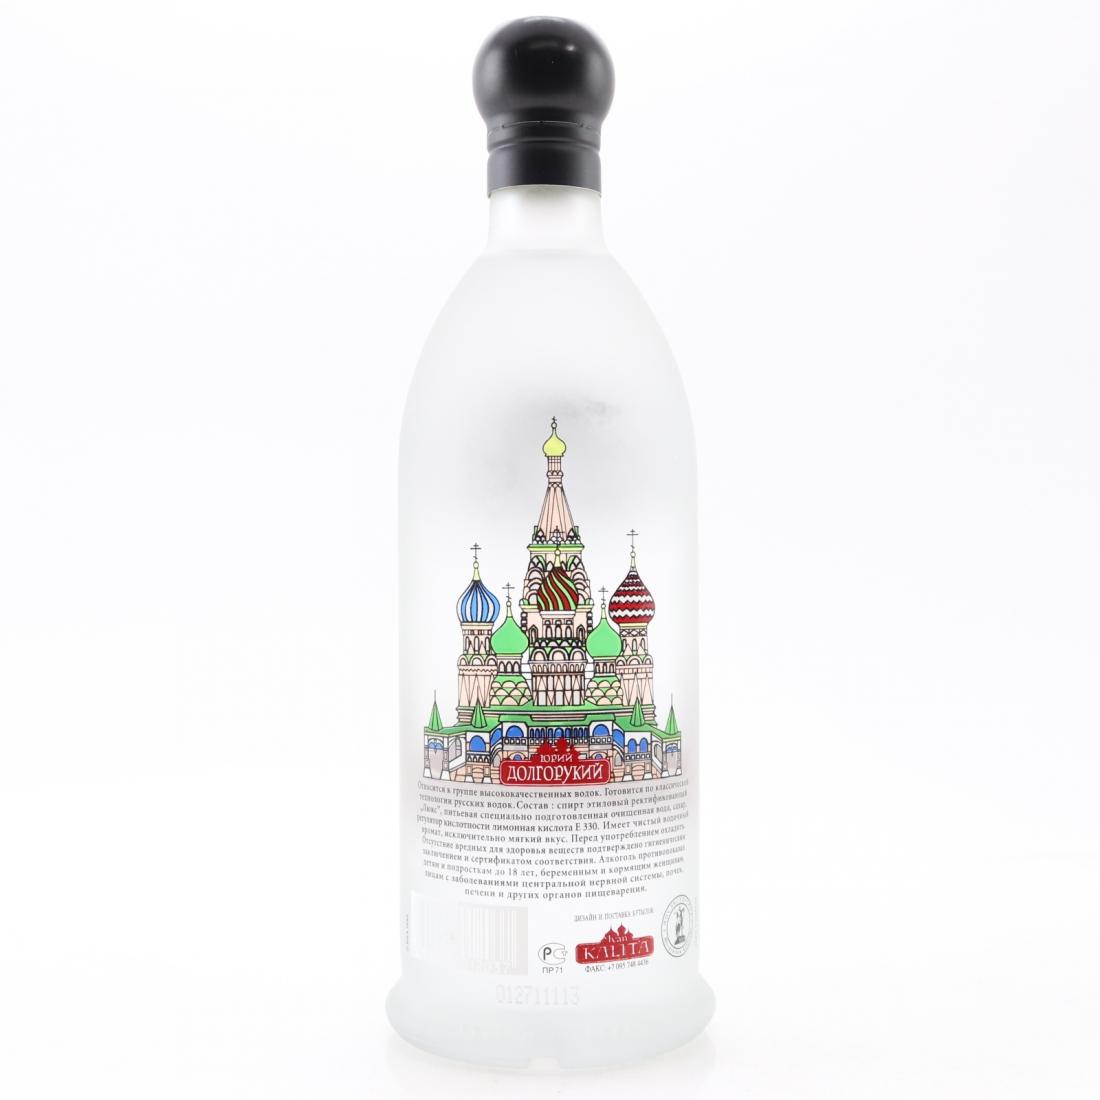 Youri Dolgoruki Premium Russian Vodka